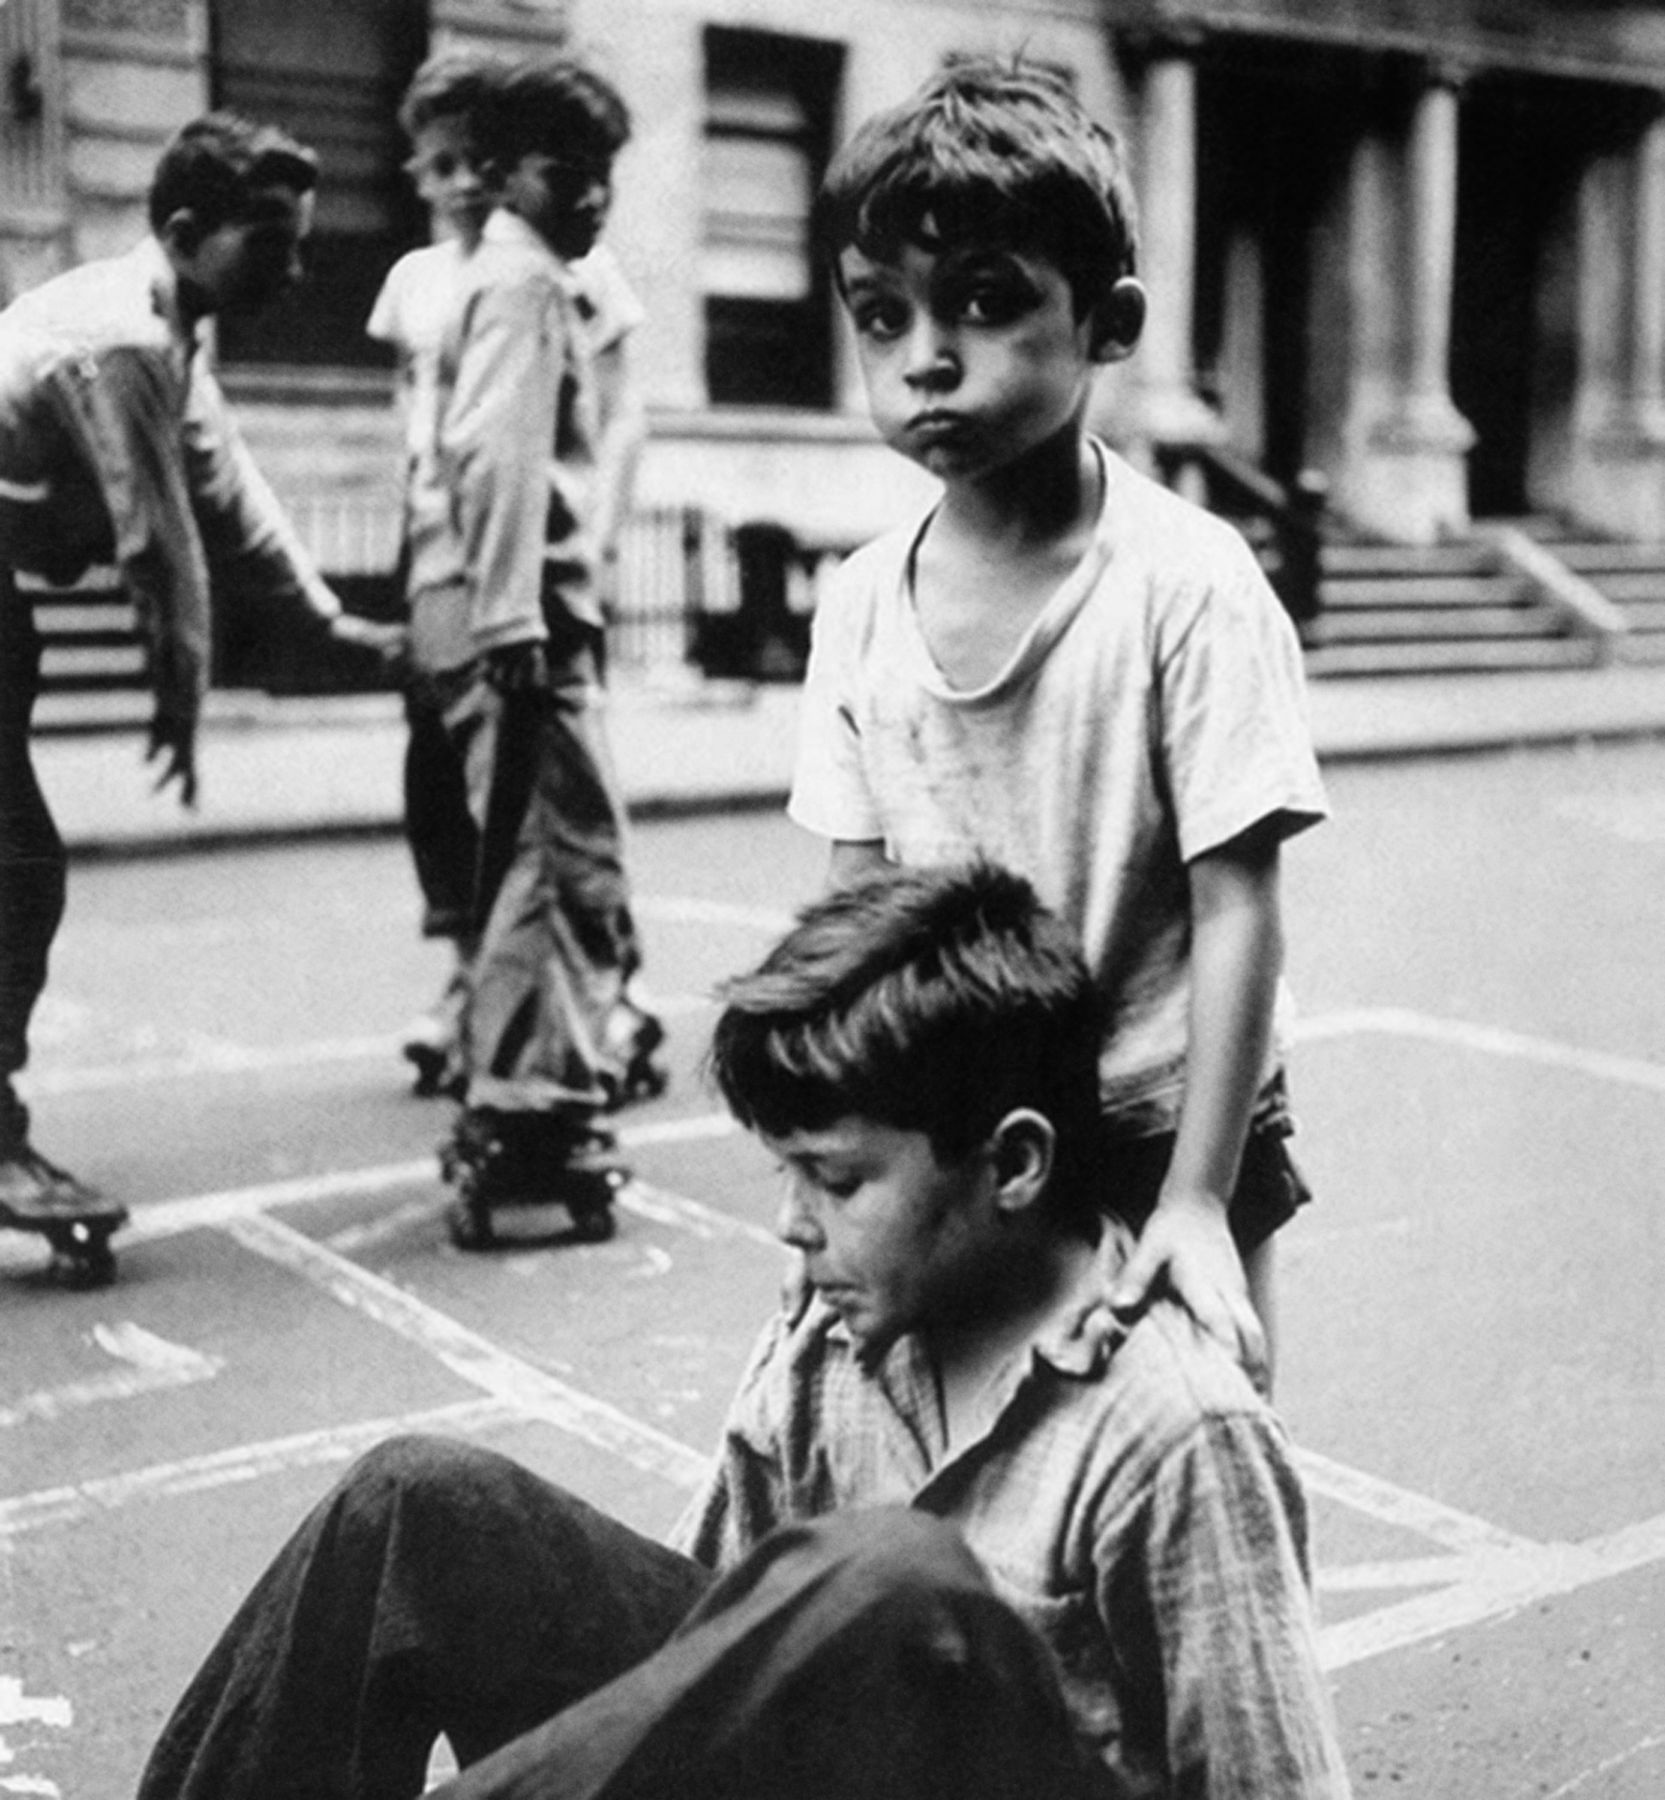 Boys on 93rd Street,New York, 1949, Silver Gelatin Photograph